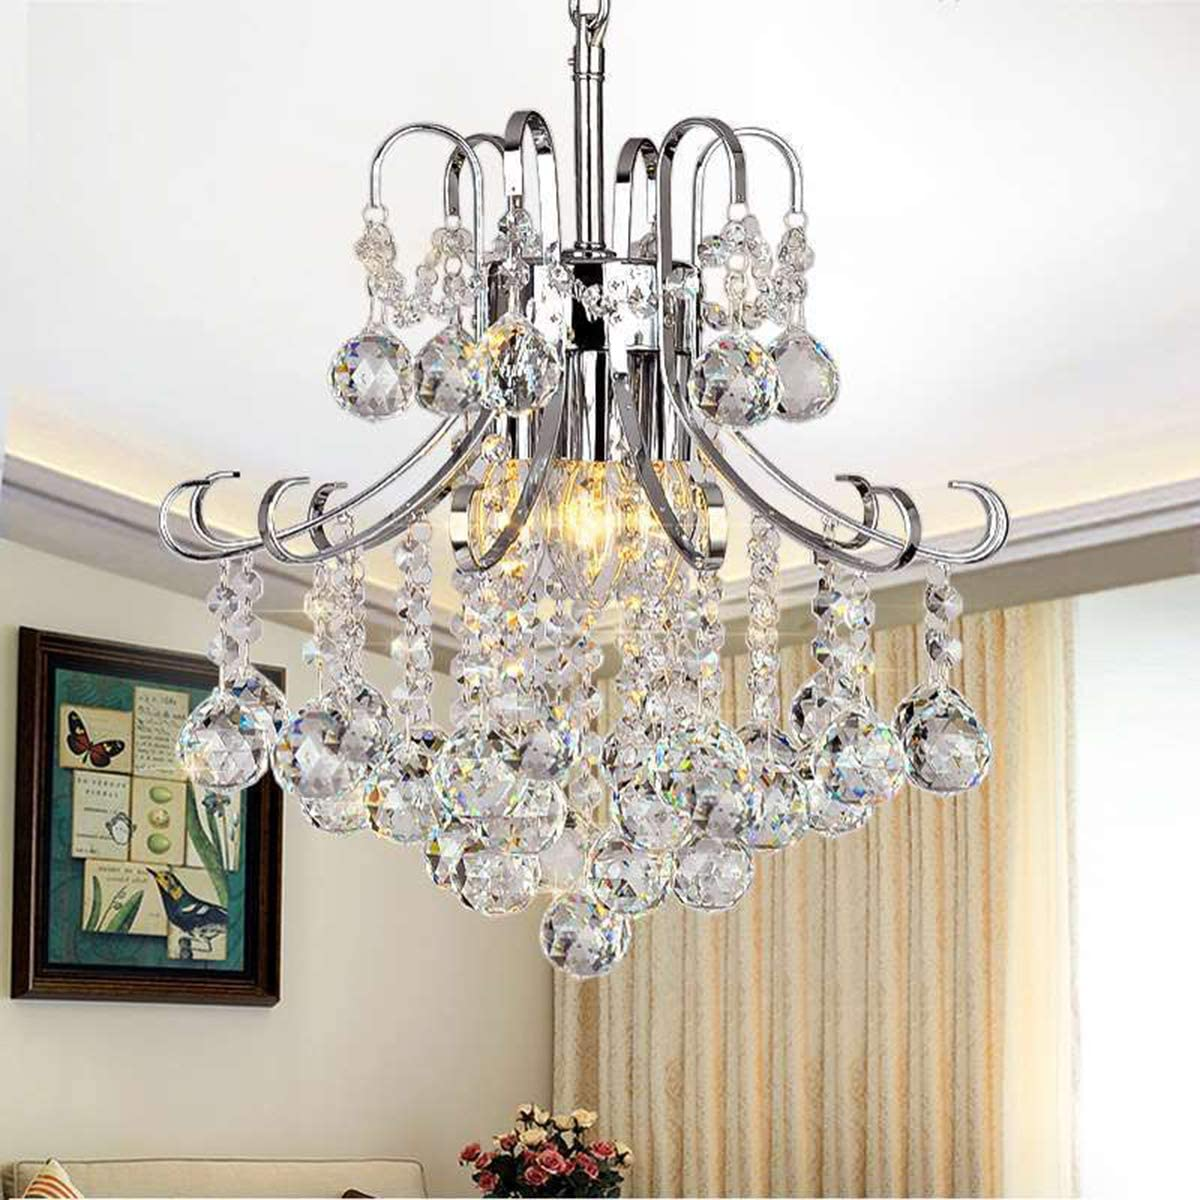 Ganeed Chandeliers,3-Light Modern Crystal Chandelier, Pendant Lighting,Flush Mount Ceiling Light Fixture for Living Room,Office,Dining Room,Bedroom,Chrome